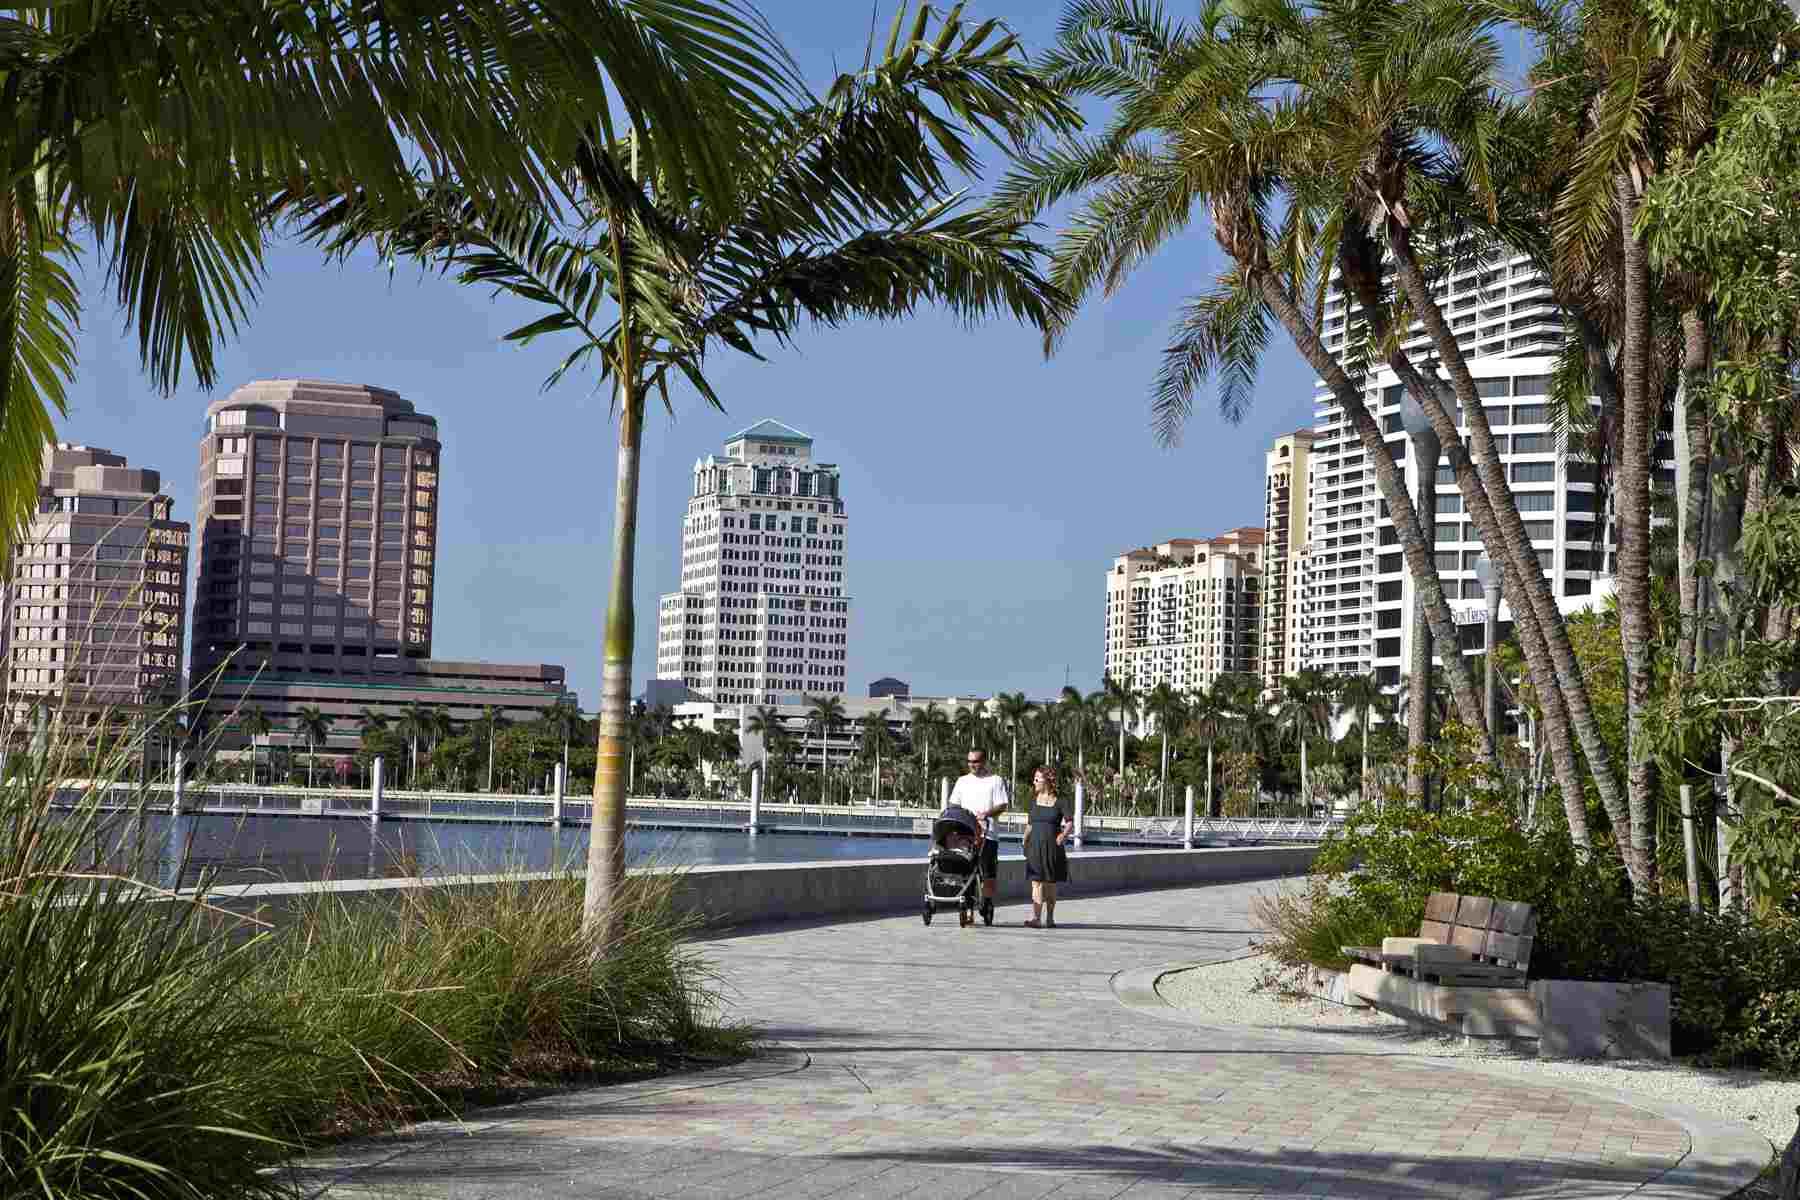 Walking along West Palm Beach